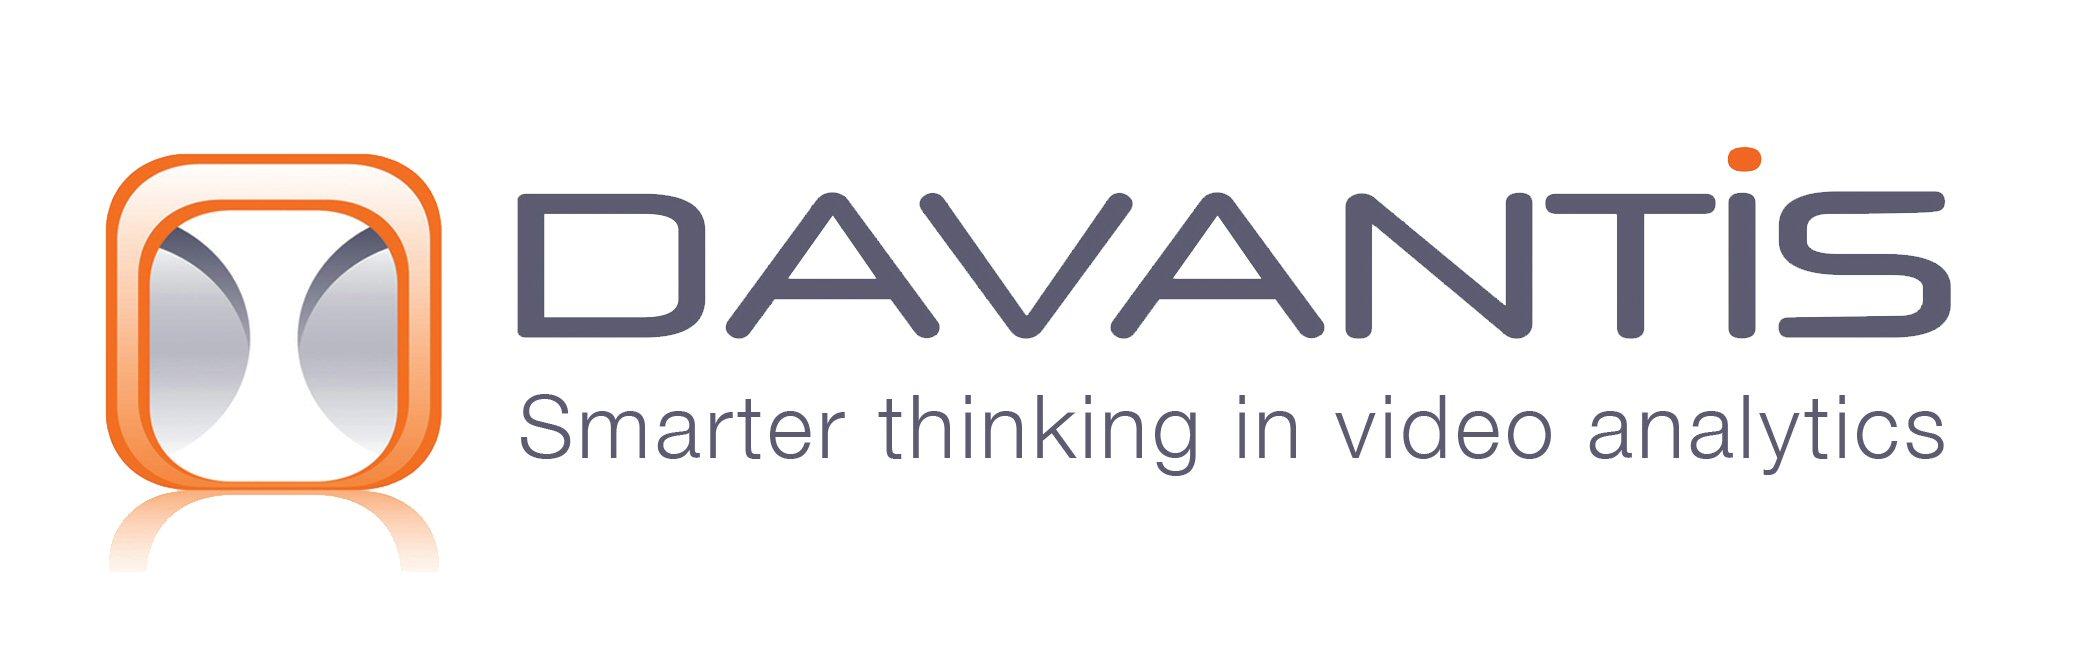 Davantis review